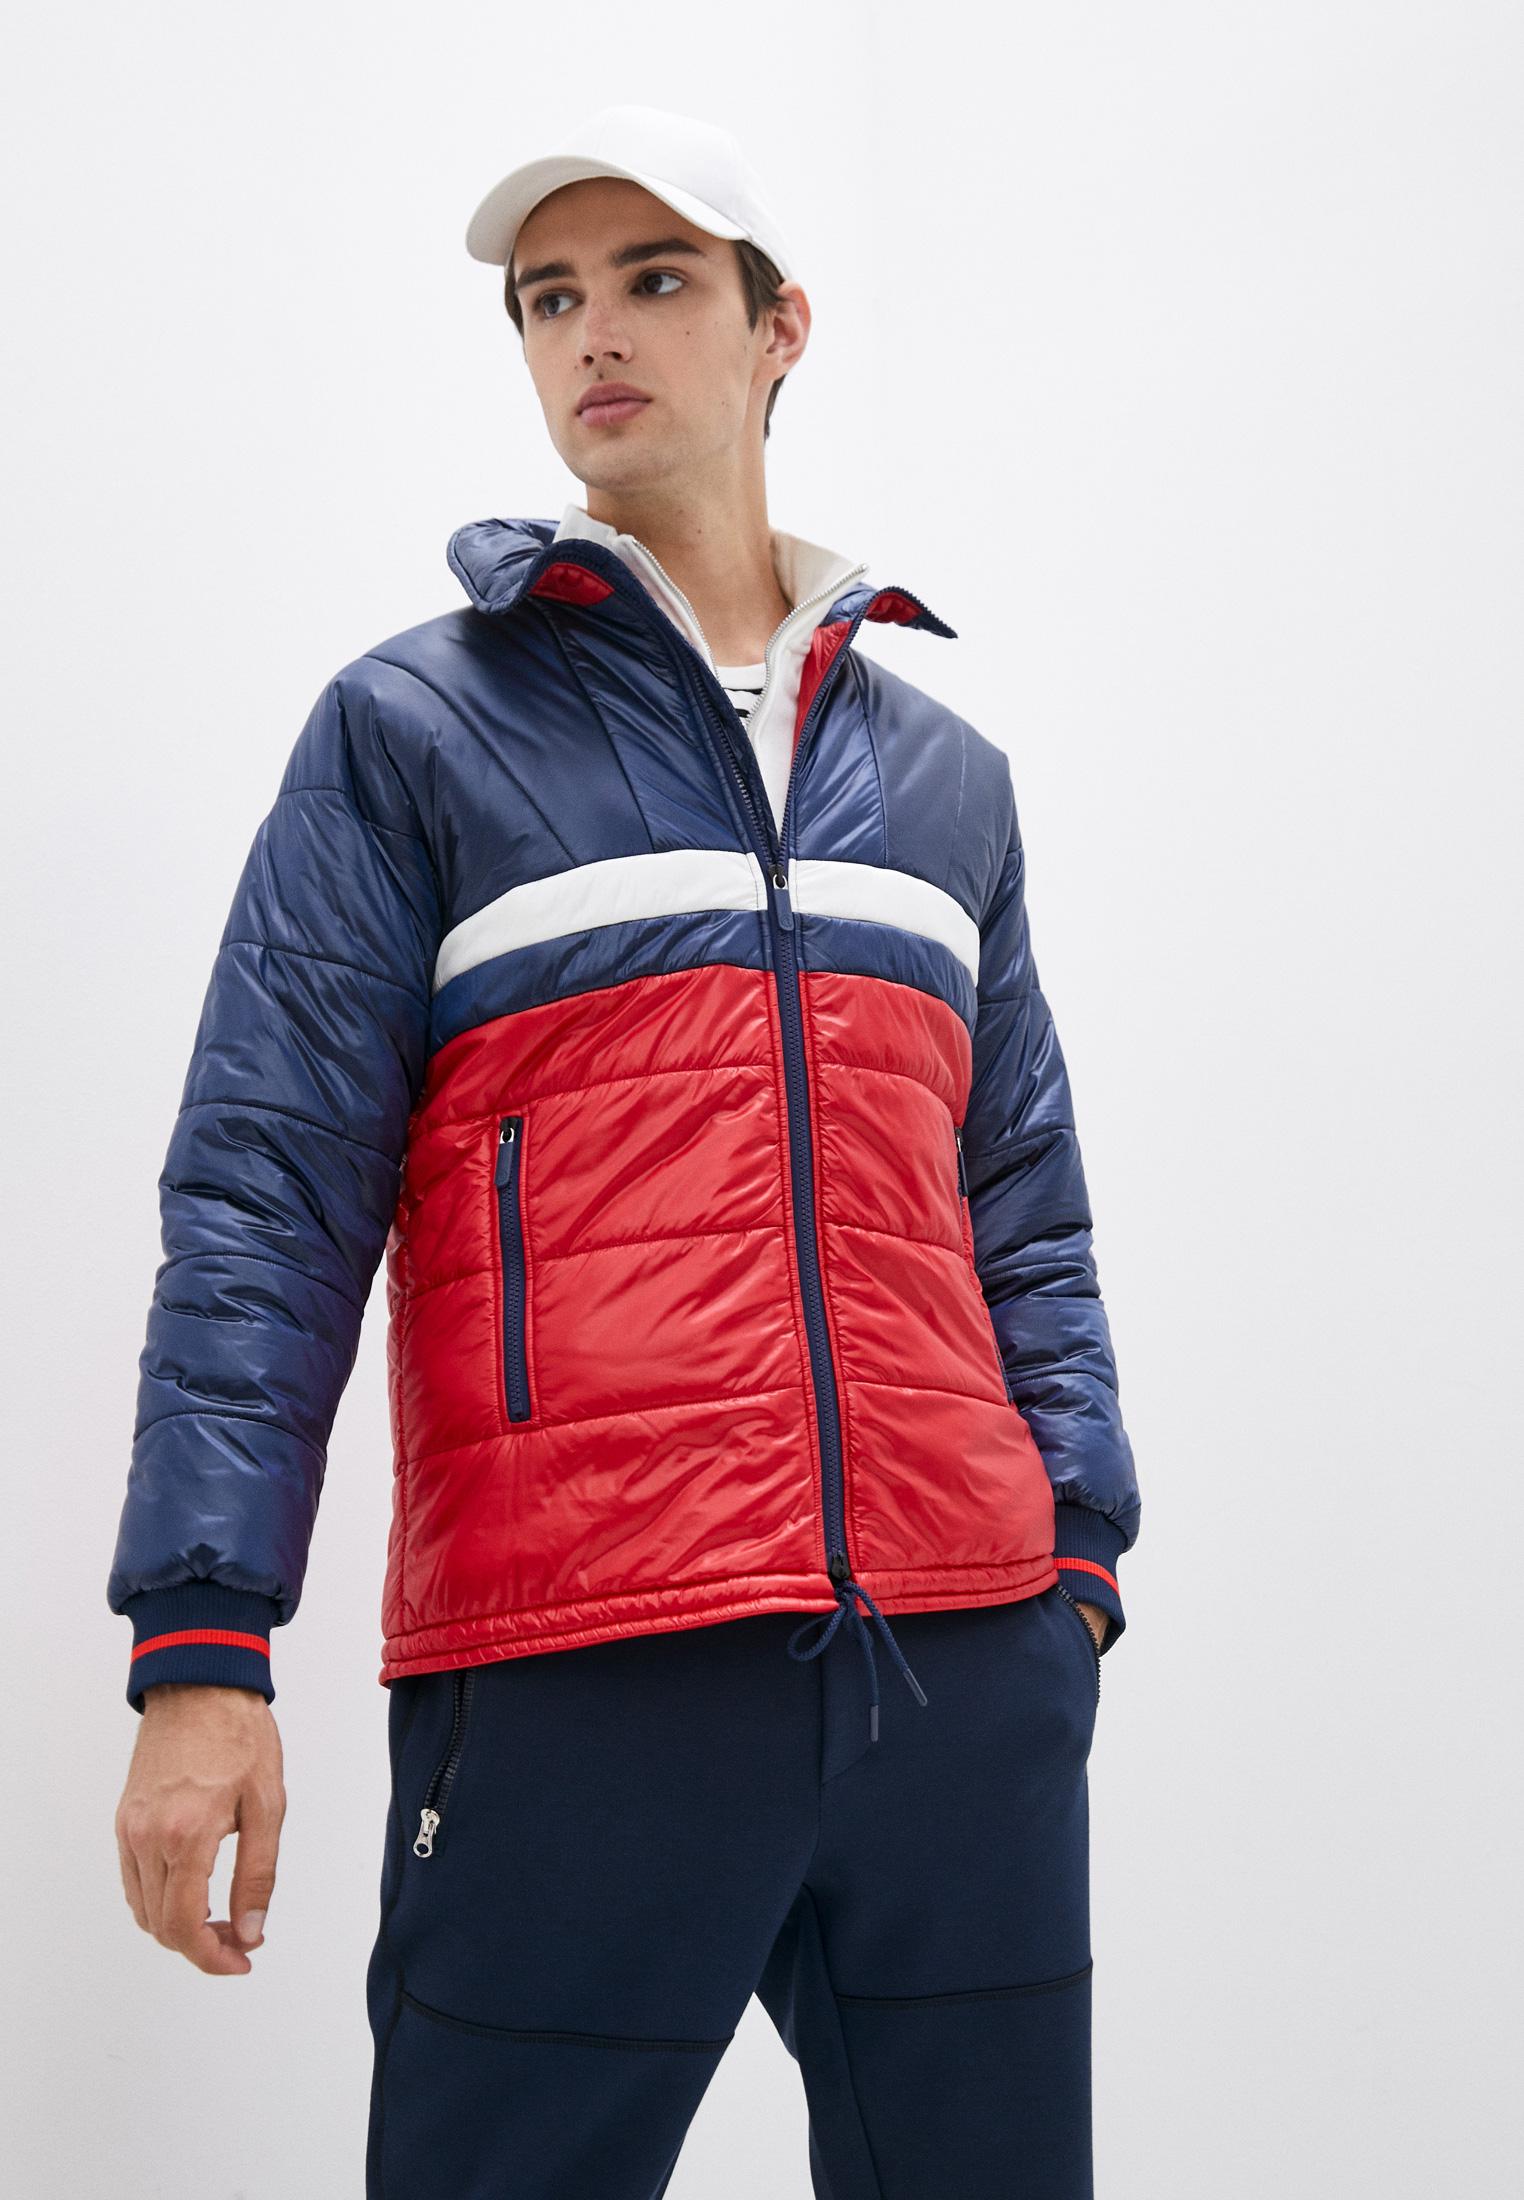 Мужская куртка Bikkembergs (Биккембергс) C H 090 00 T 9846: изображение 1